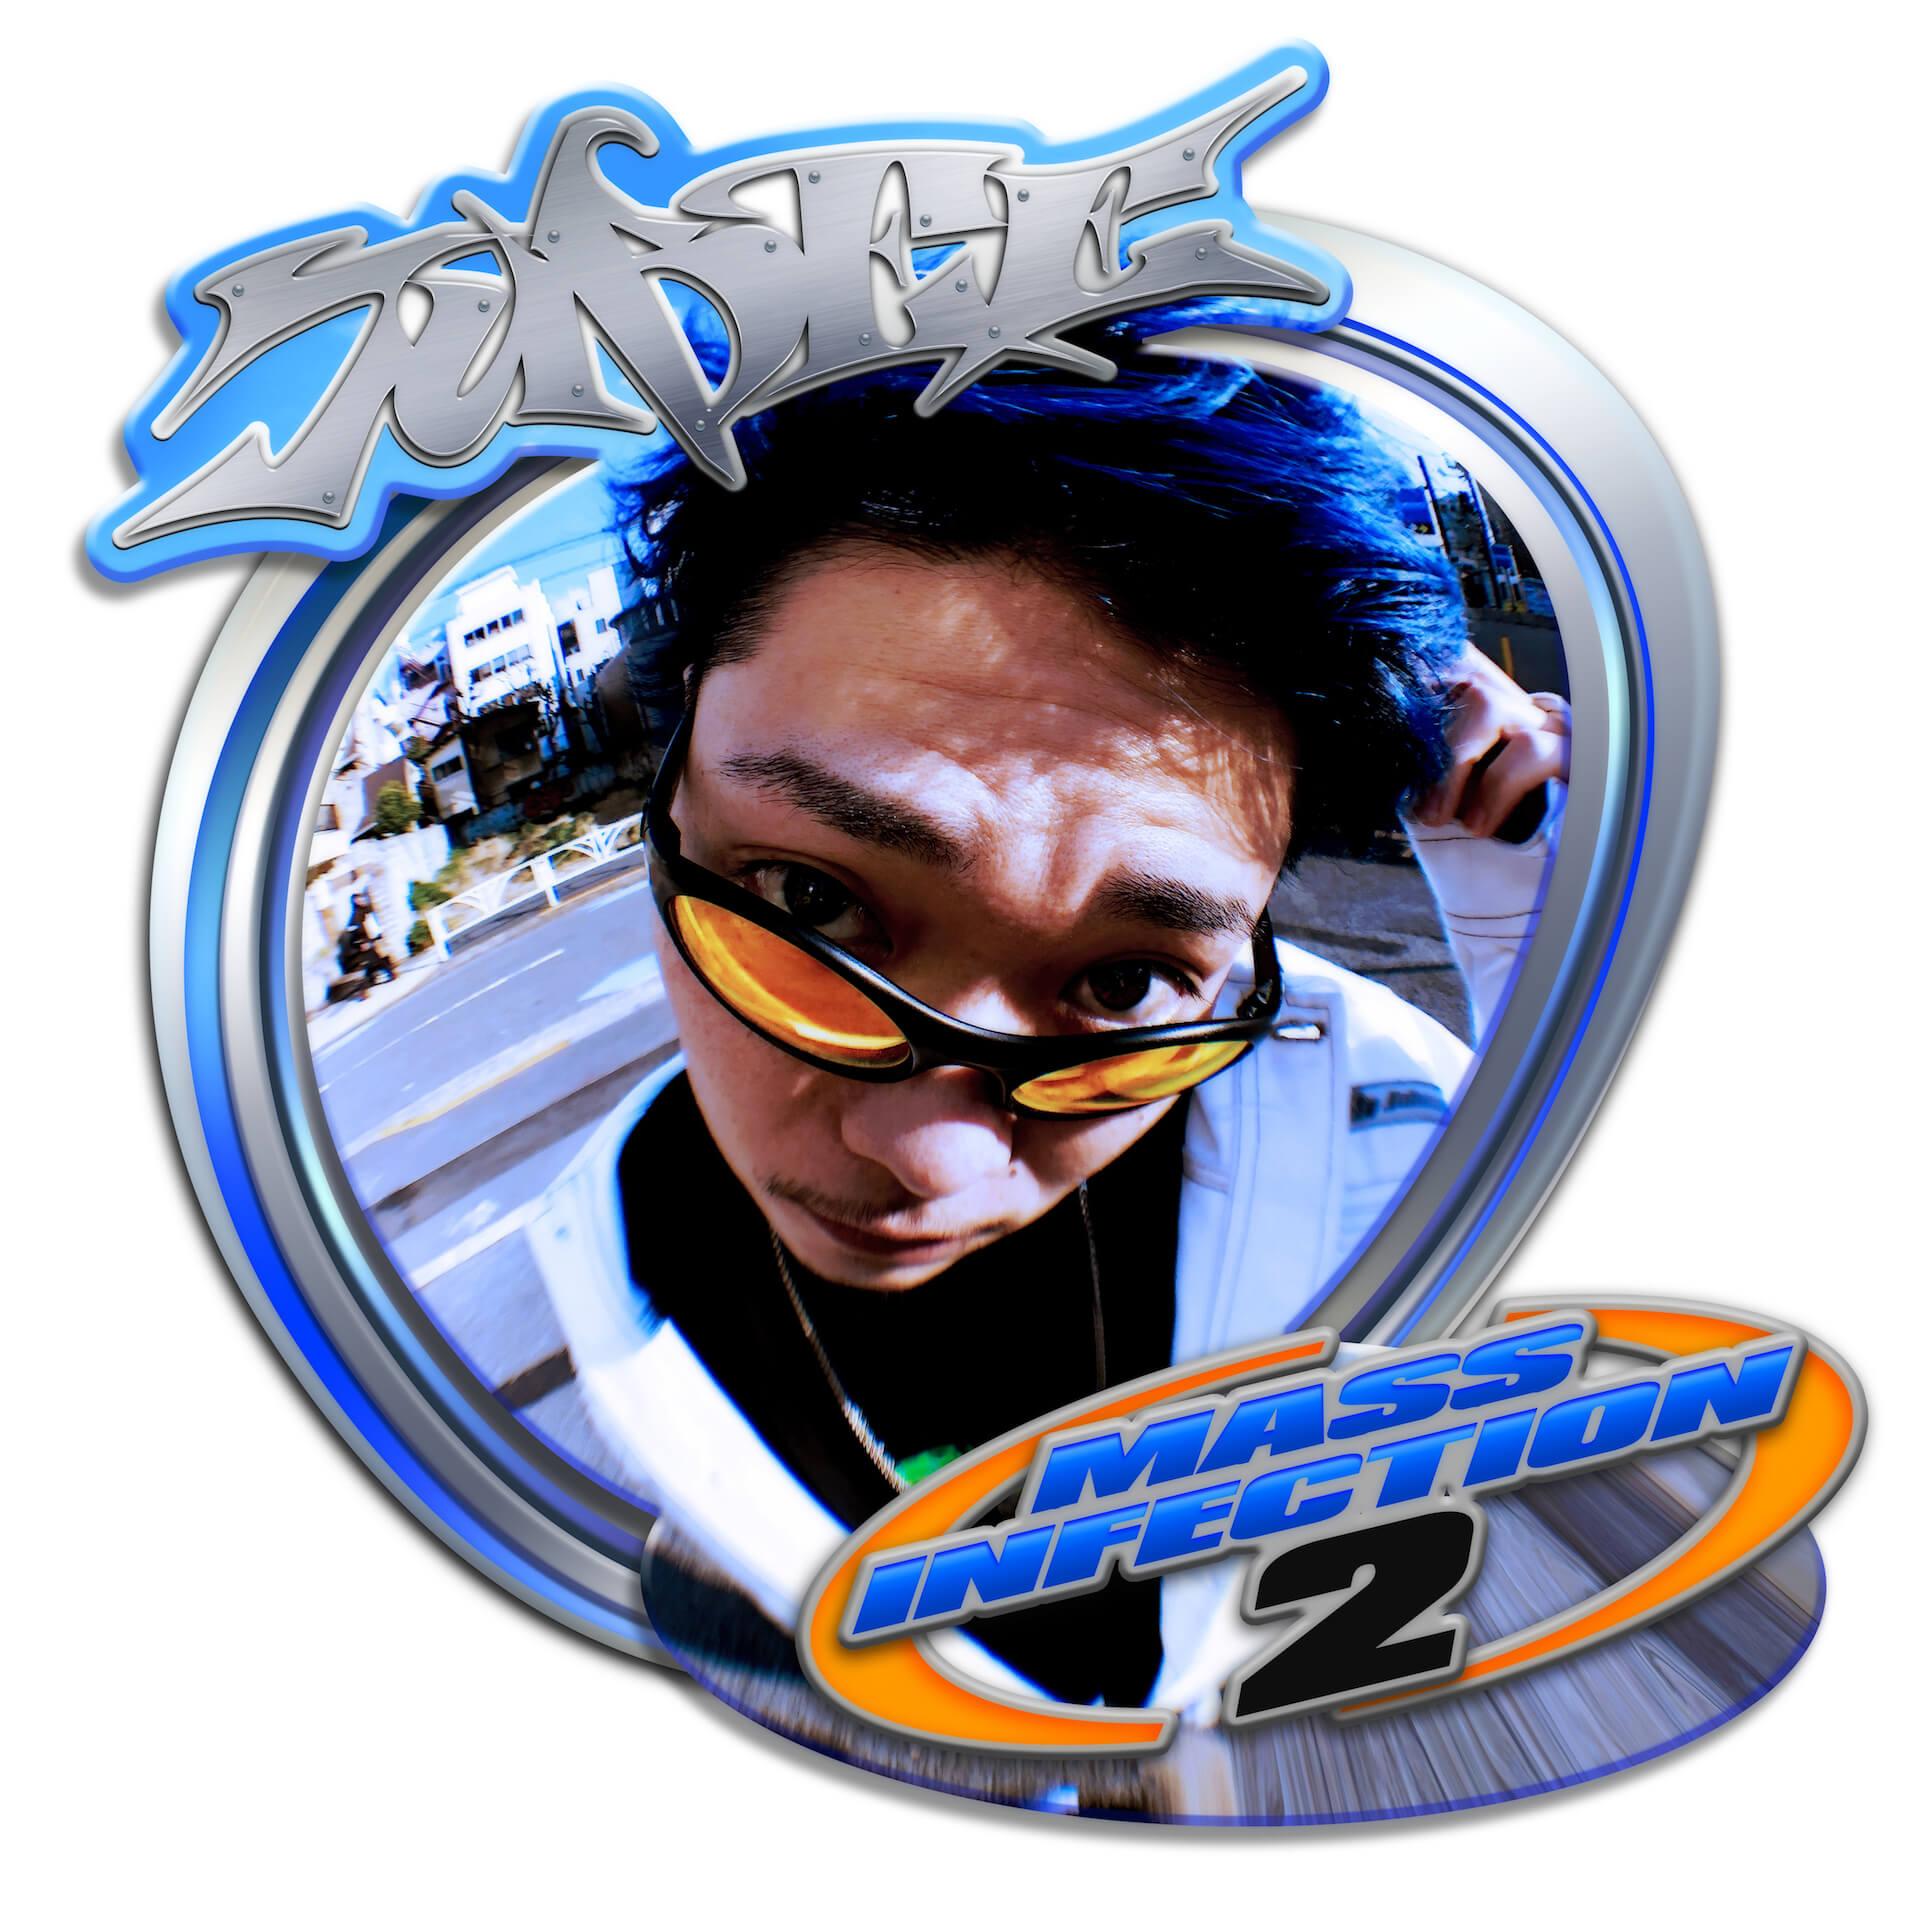 "JUBEEがSARA-Jを迎えた2ステップ・サウンドの楽曲""Joyride""のMVを公開|BABEL LABEL・Riku Ozamaが監修 music200721_jubee_2"